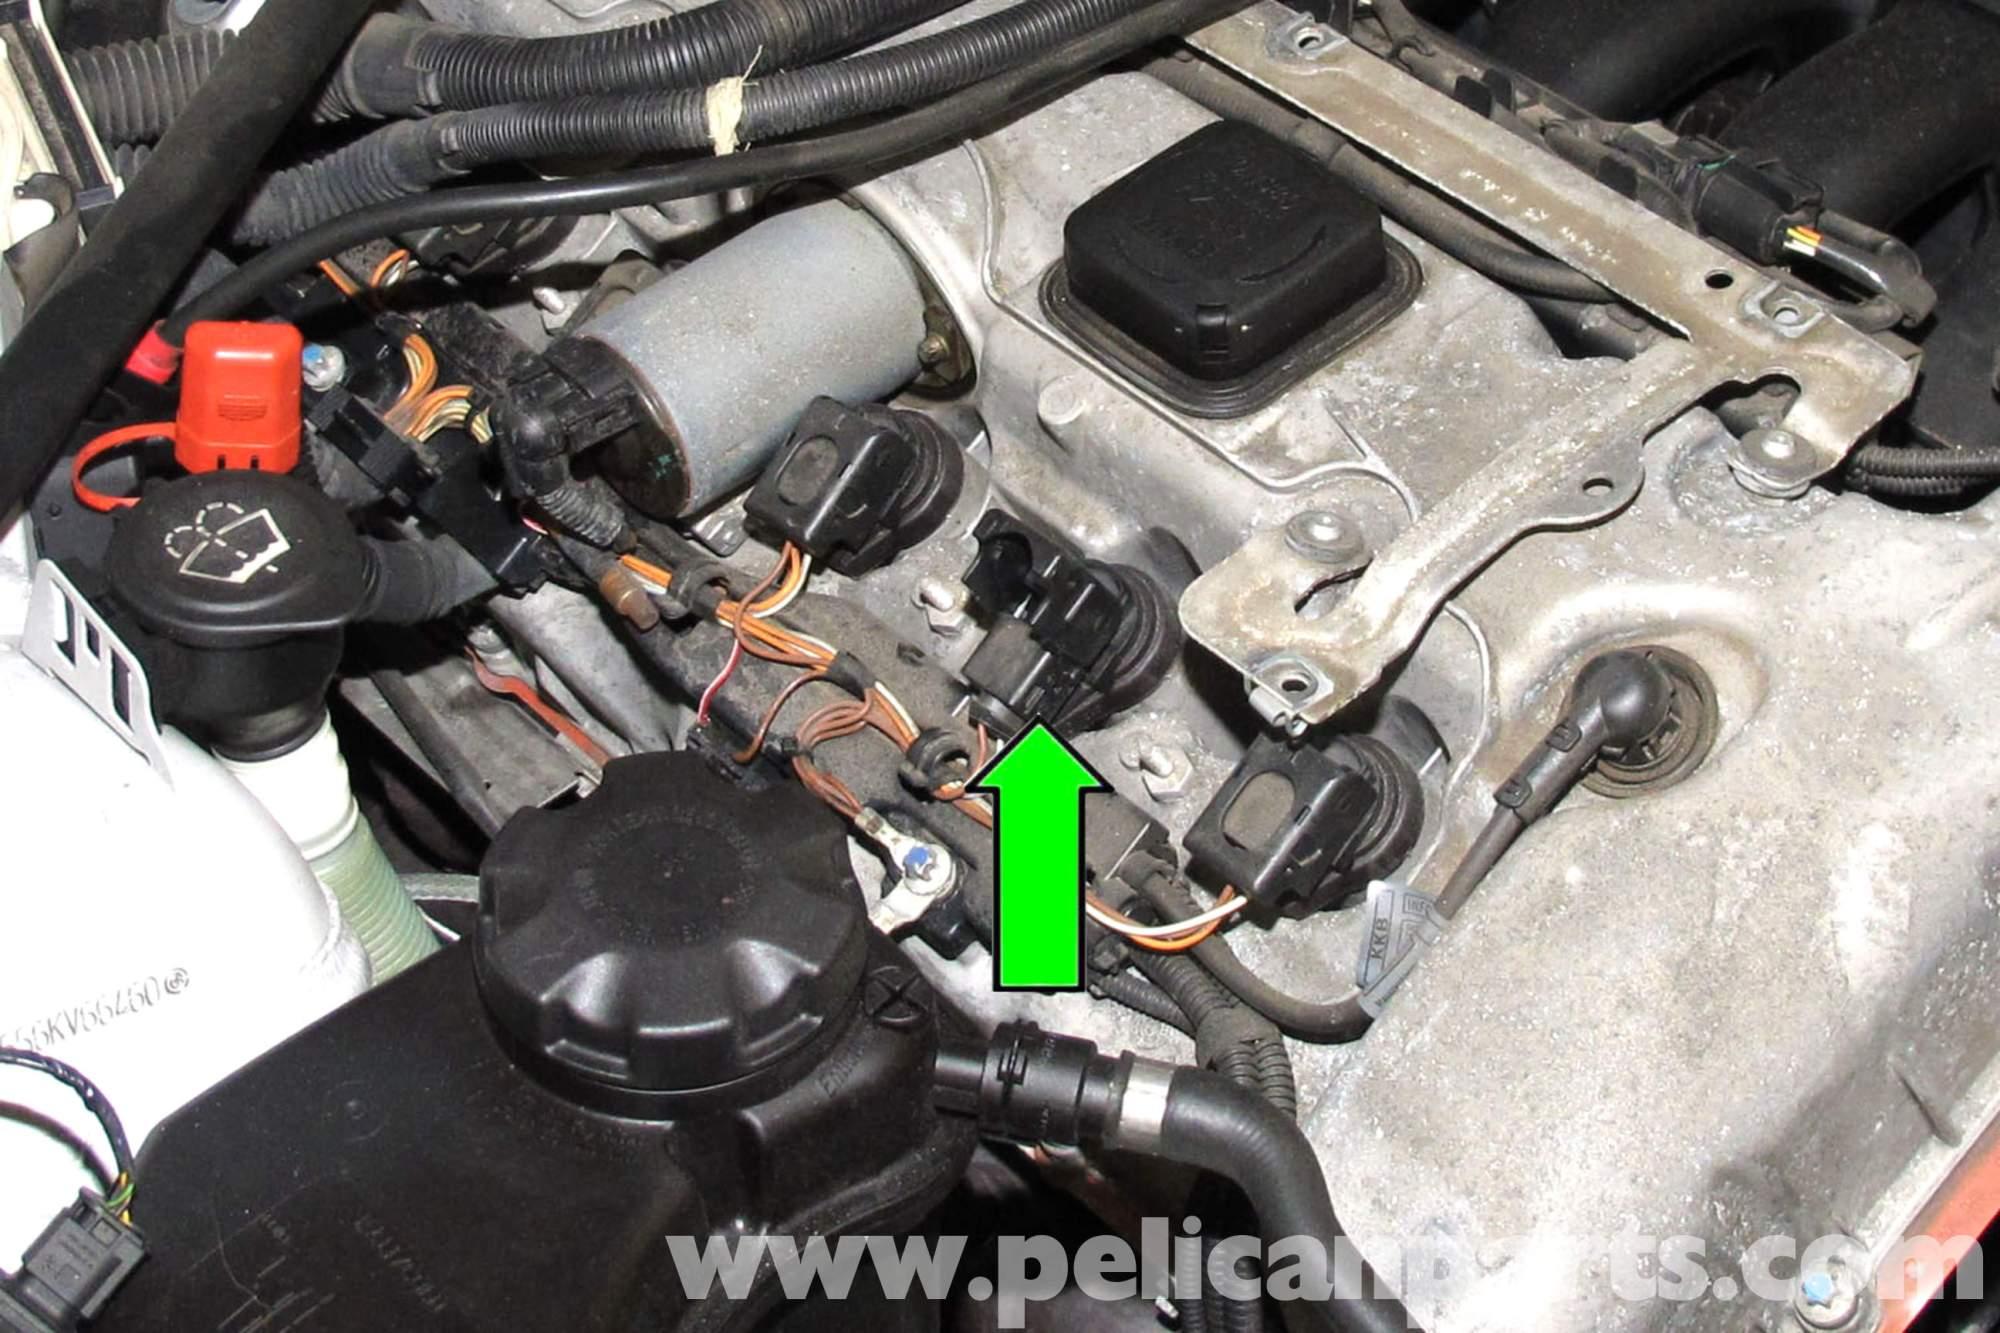 hight resolution of bmw e90 spark plug and coil replacement e91 e92 e93 pelican e90 ignition coil wiring diagram